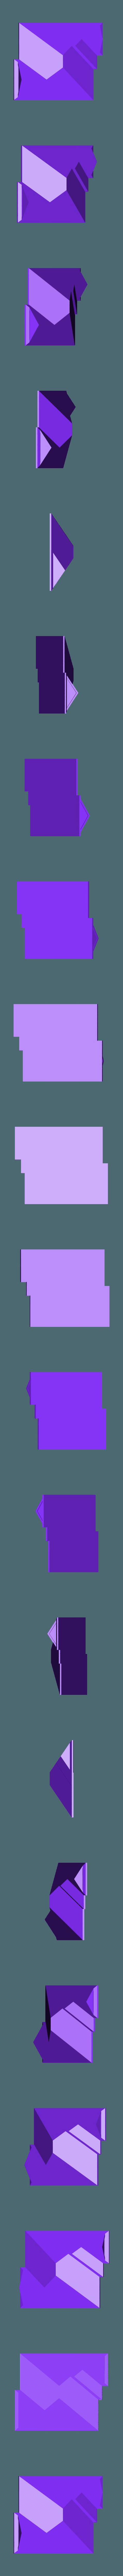 My_House_Roof.stl Download free STL file My Suburban House (N-Scale) • 3D printer object, MFouillard